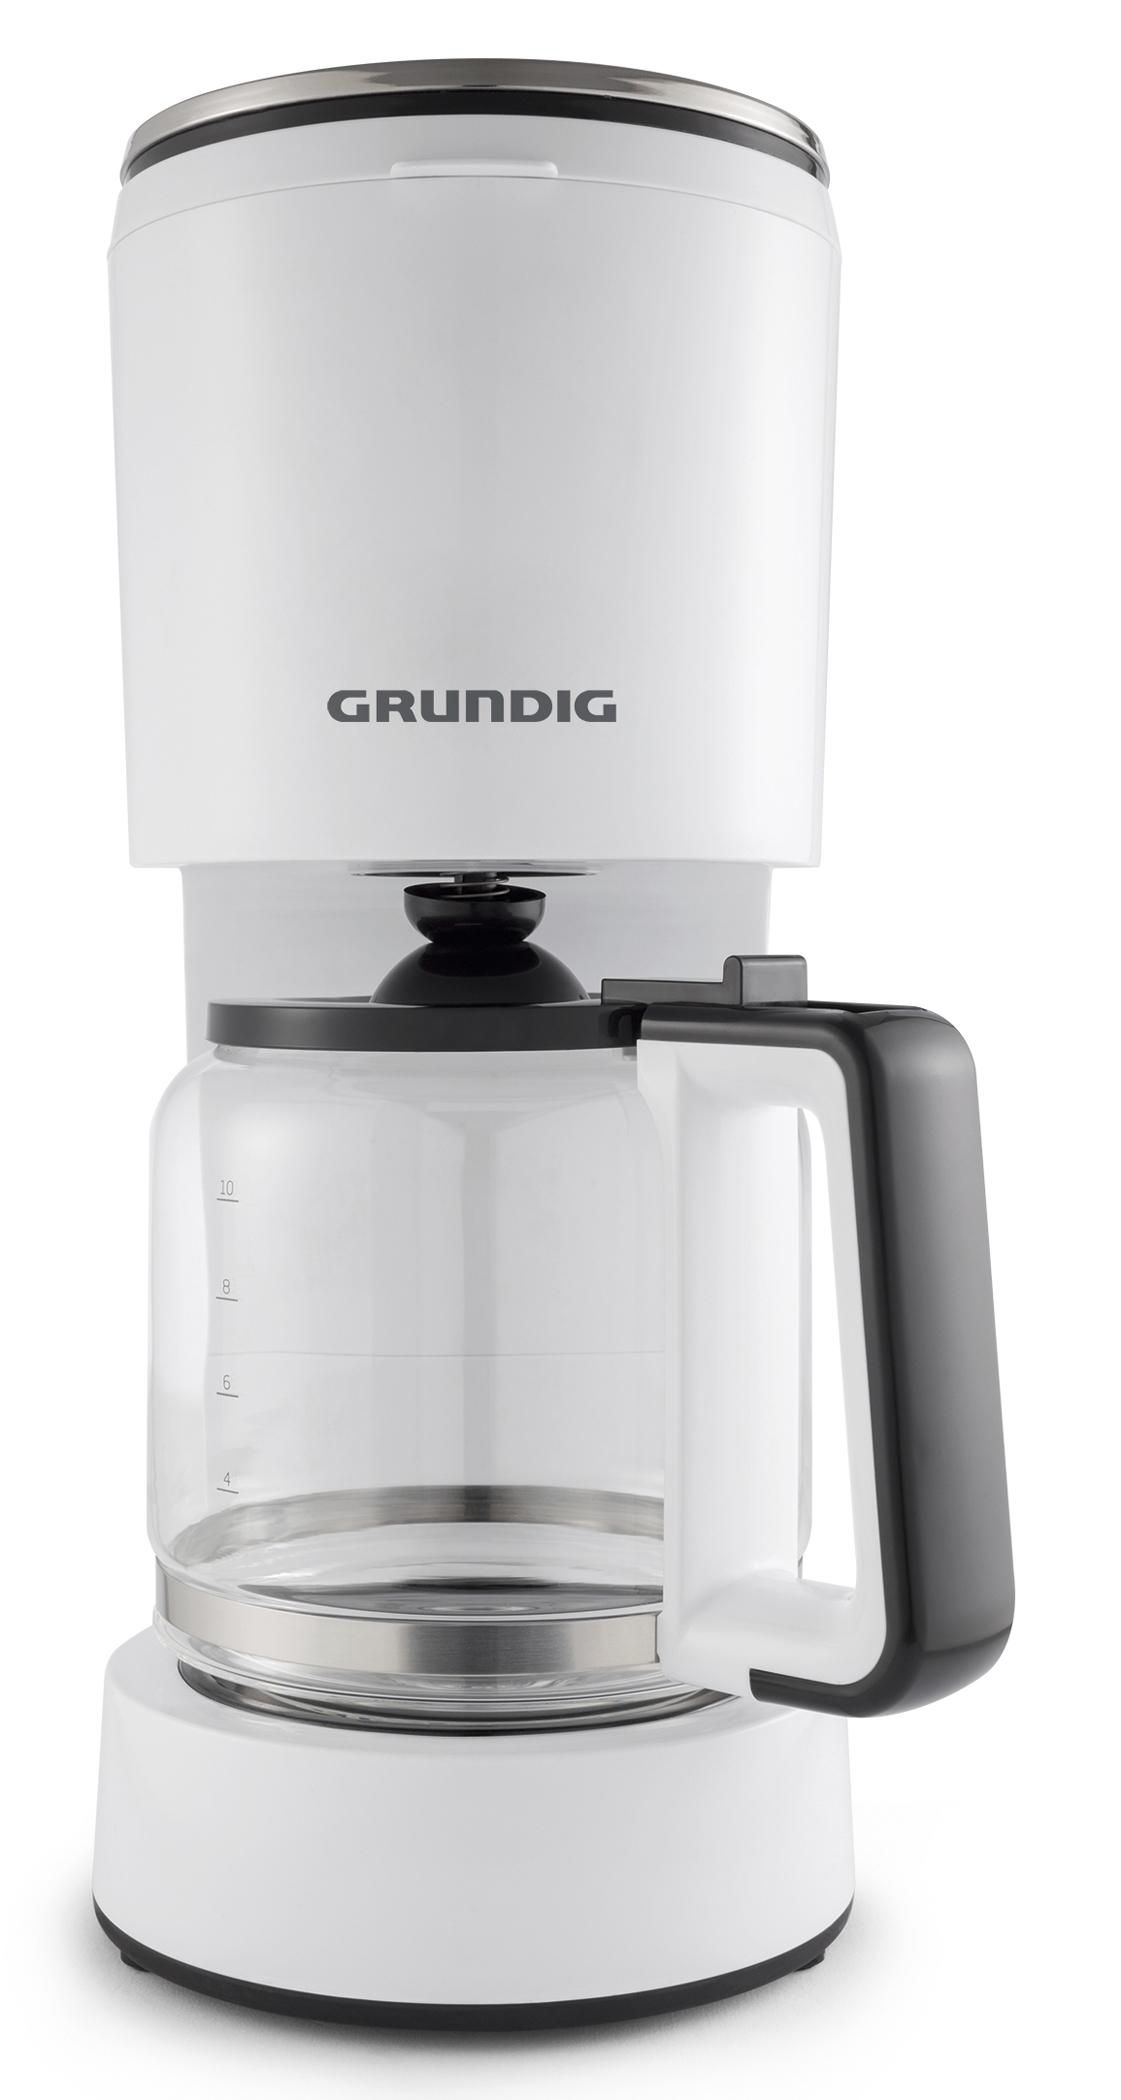 <h1>Grundig Kaffeemaschine KM 5860</h1><h3 style='font-size: 20px; margin: 0px 0px 15px 0px;'> -Filterkaffeemaschine, Aroma control</h3>